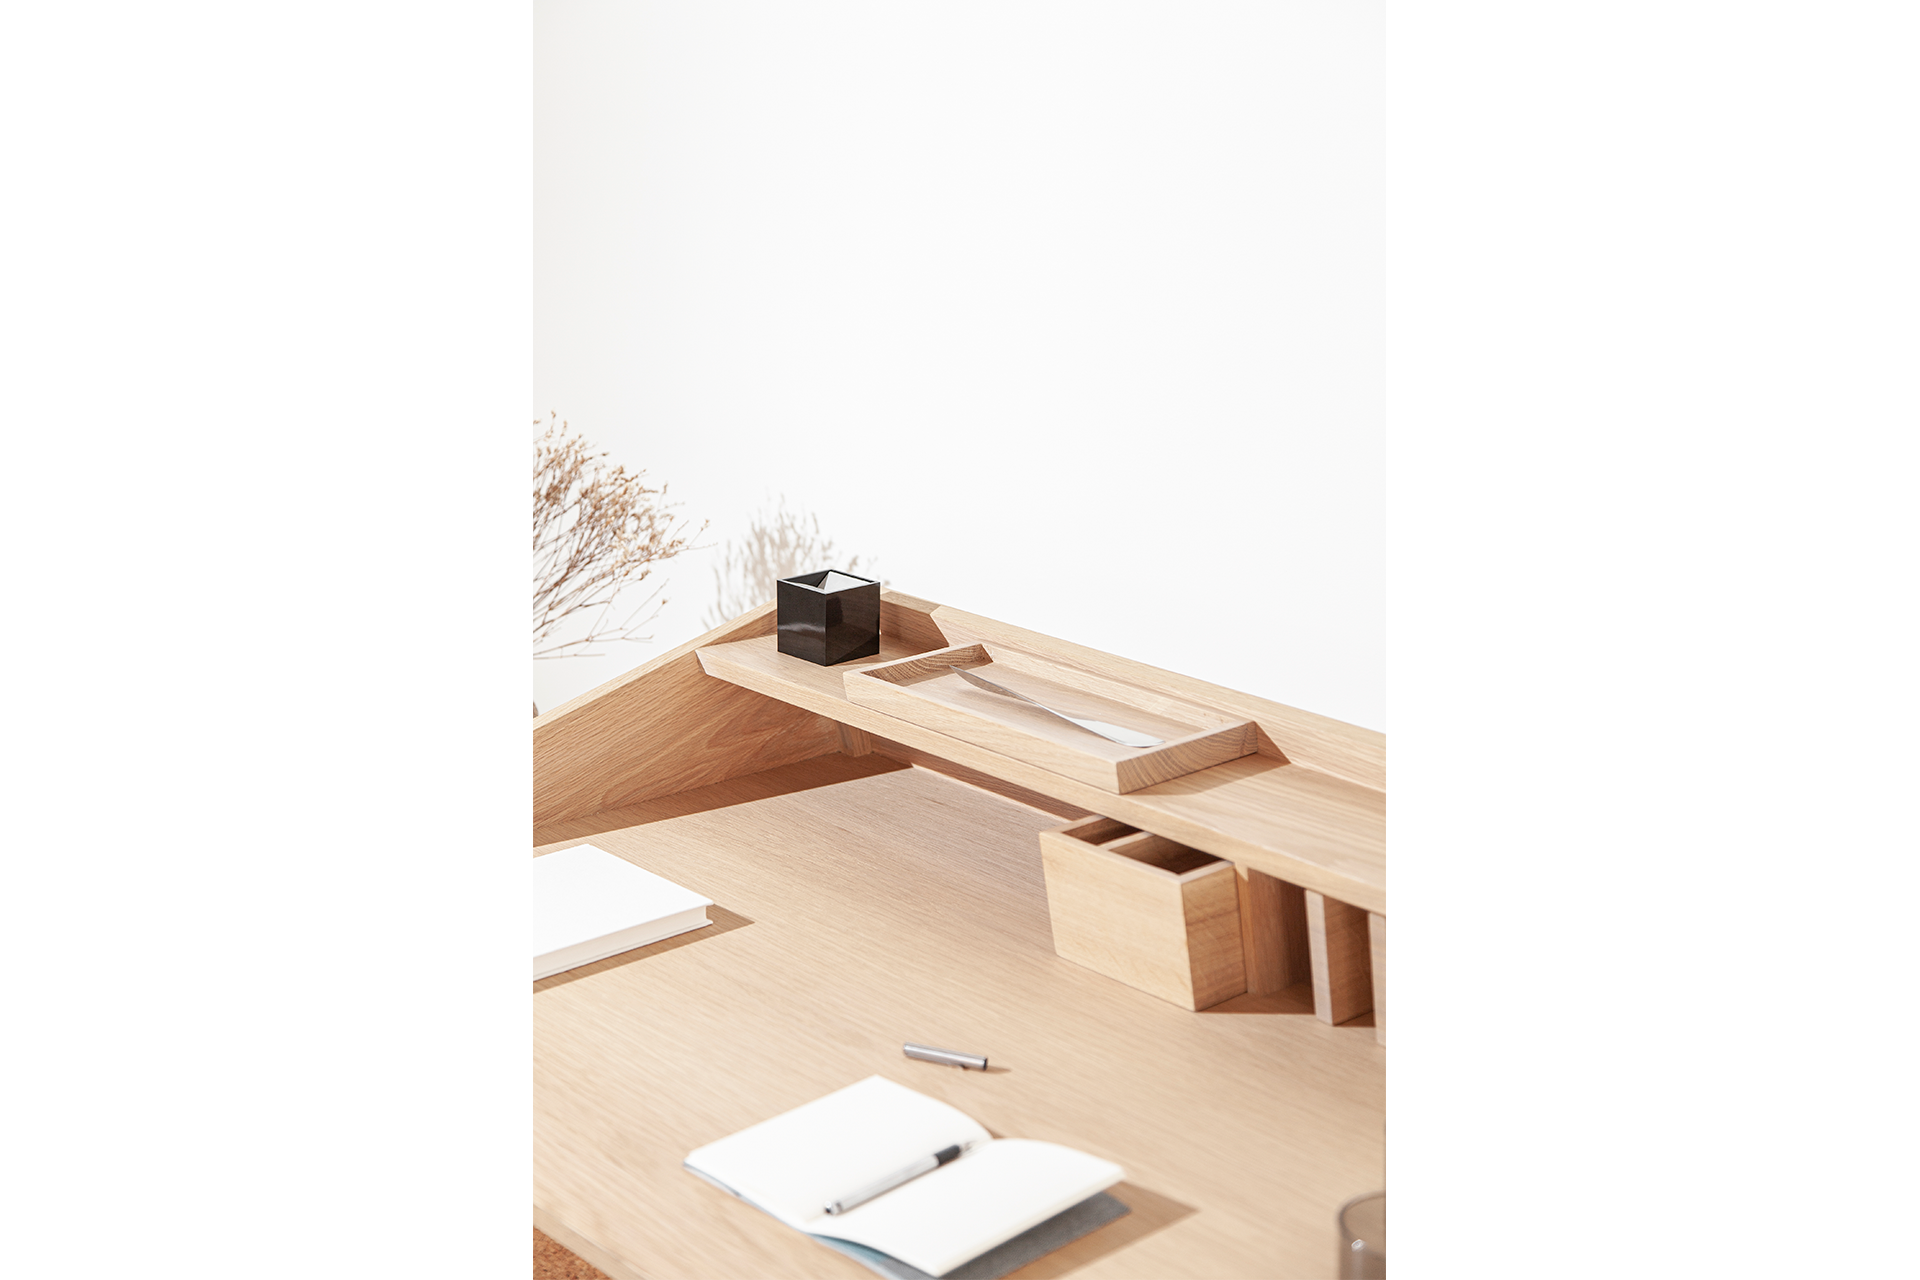 Torta Desk- DESIGN BY MIGUEL SOEIRO